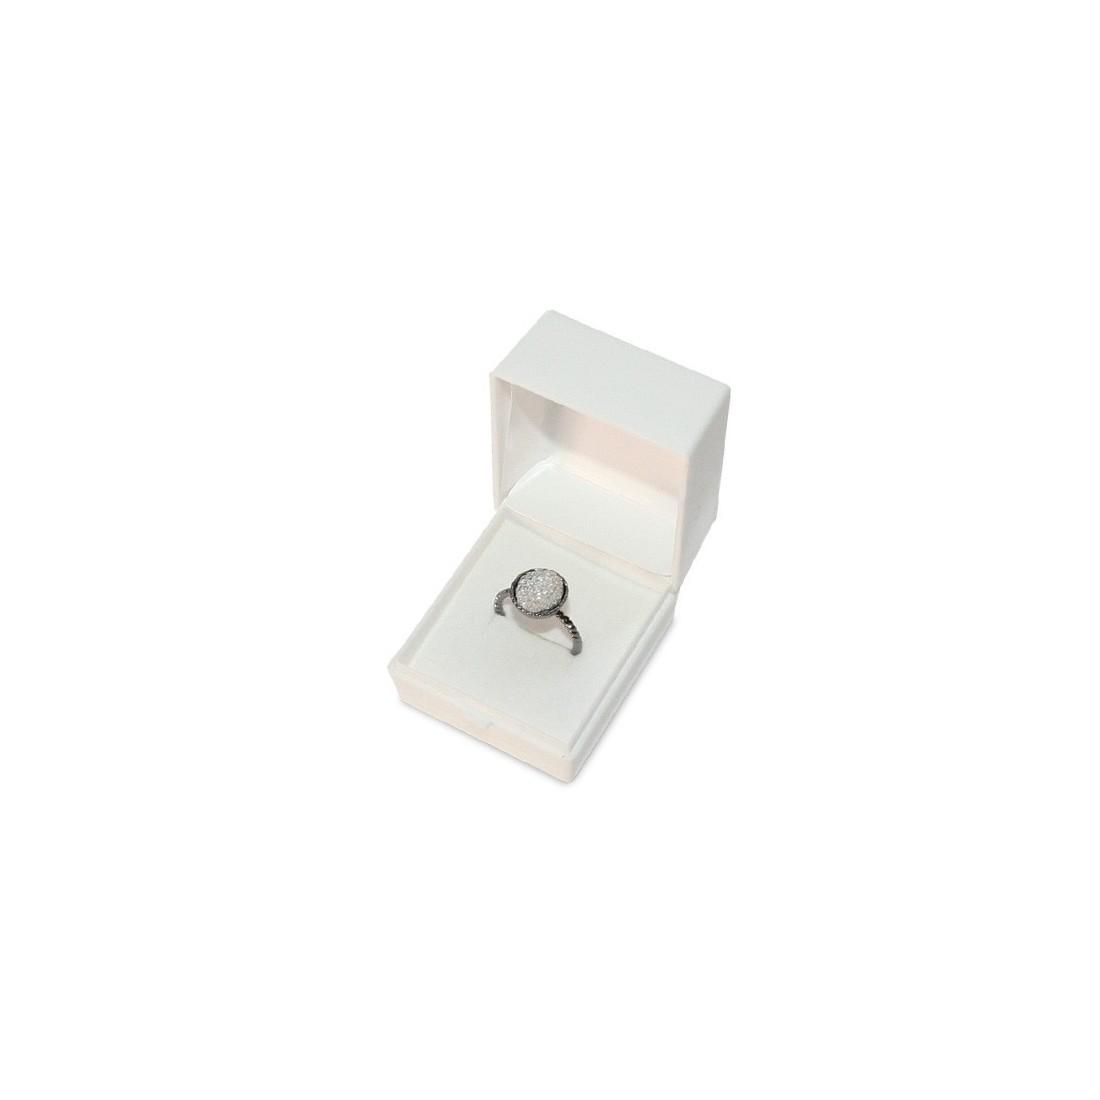 Europa Jewellery Box, Multipurpose